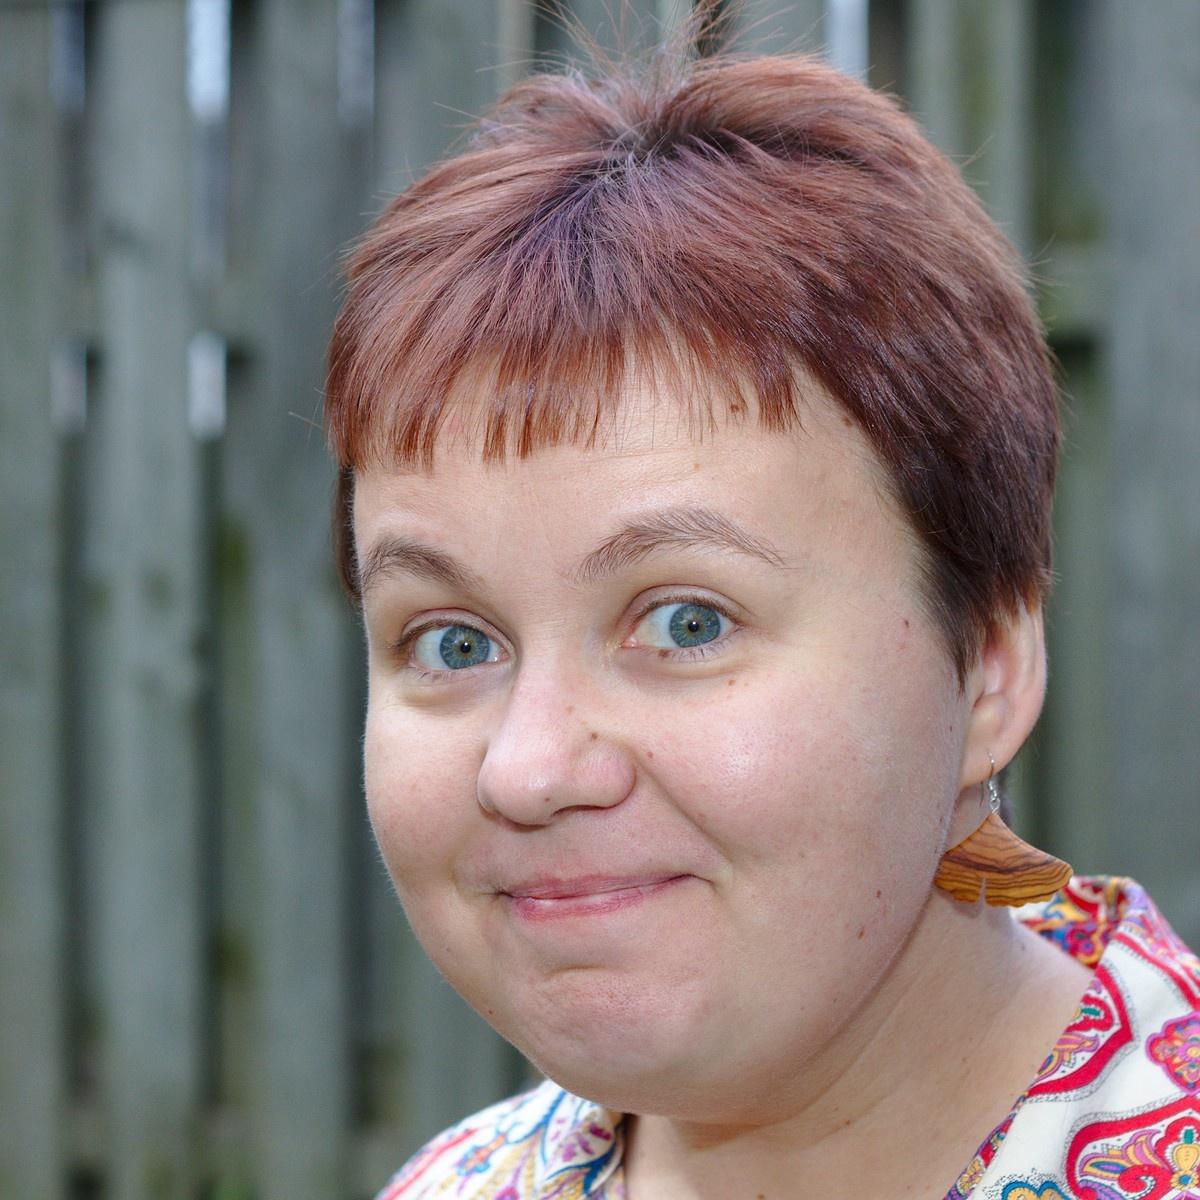 Evgenia Vlasova: biography and creativity